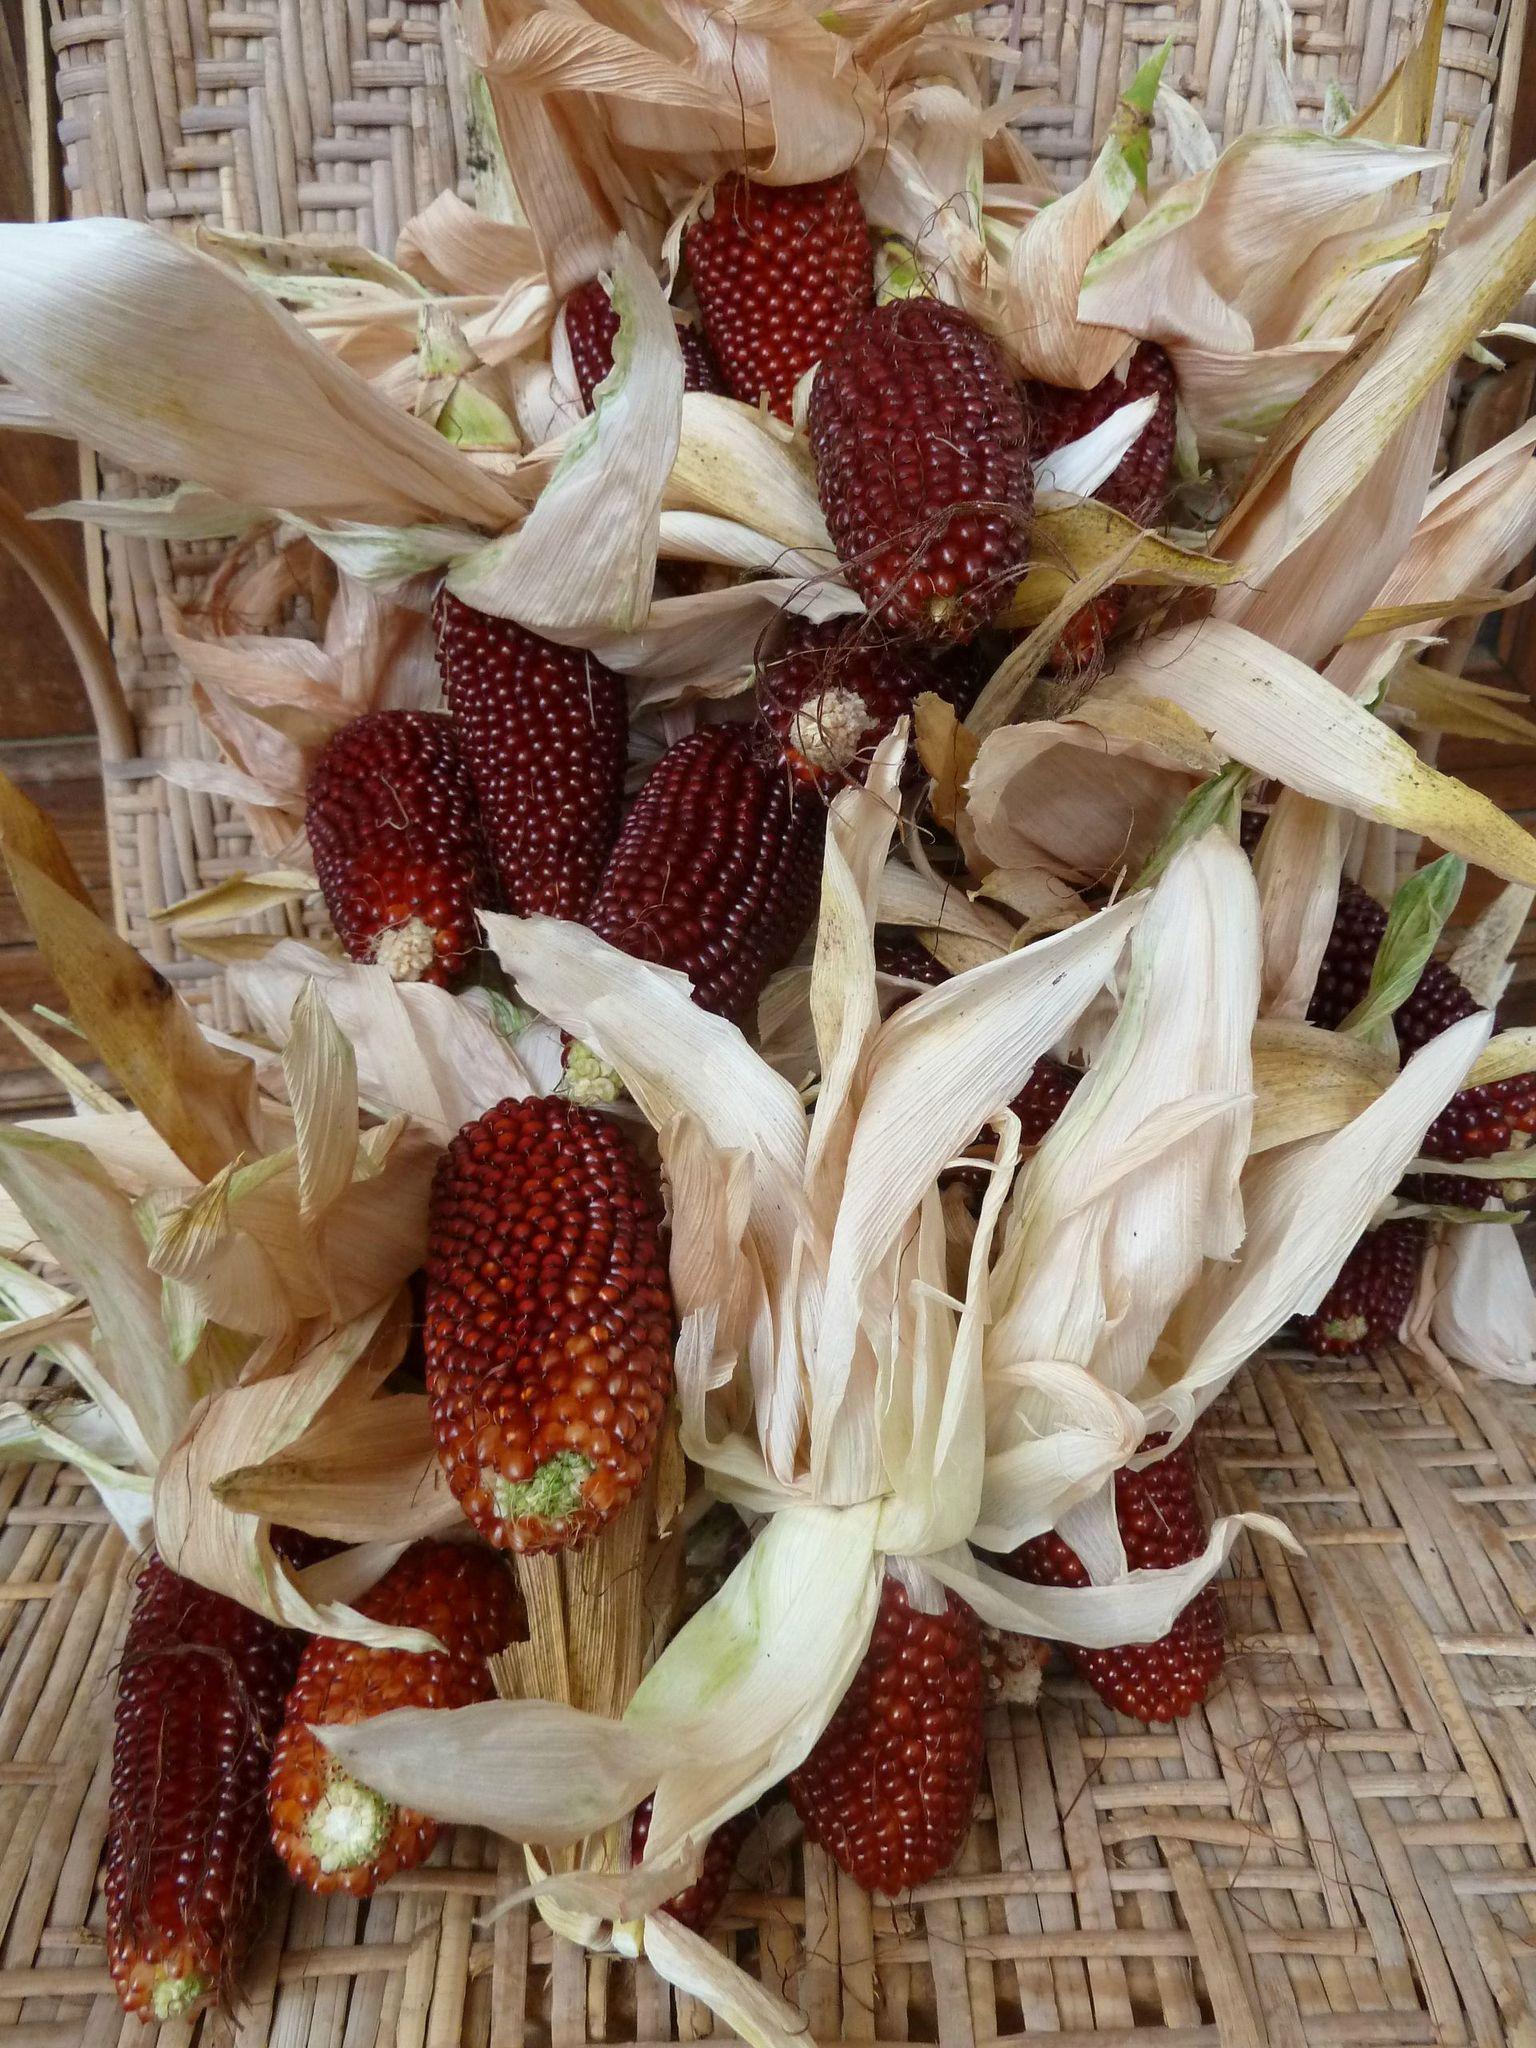 maïs fraise - www.passionpotager.canalblog.com